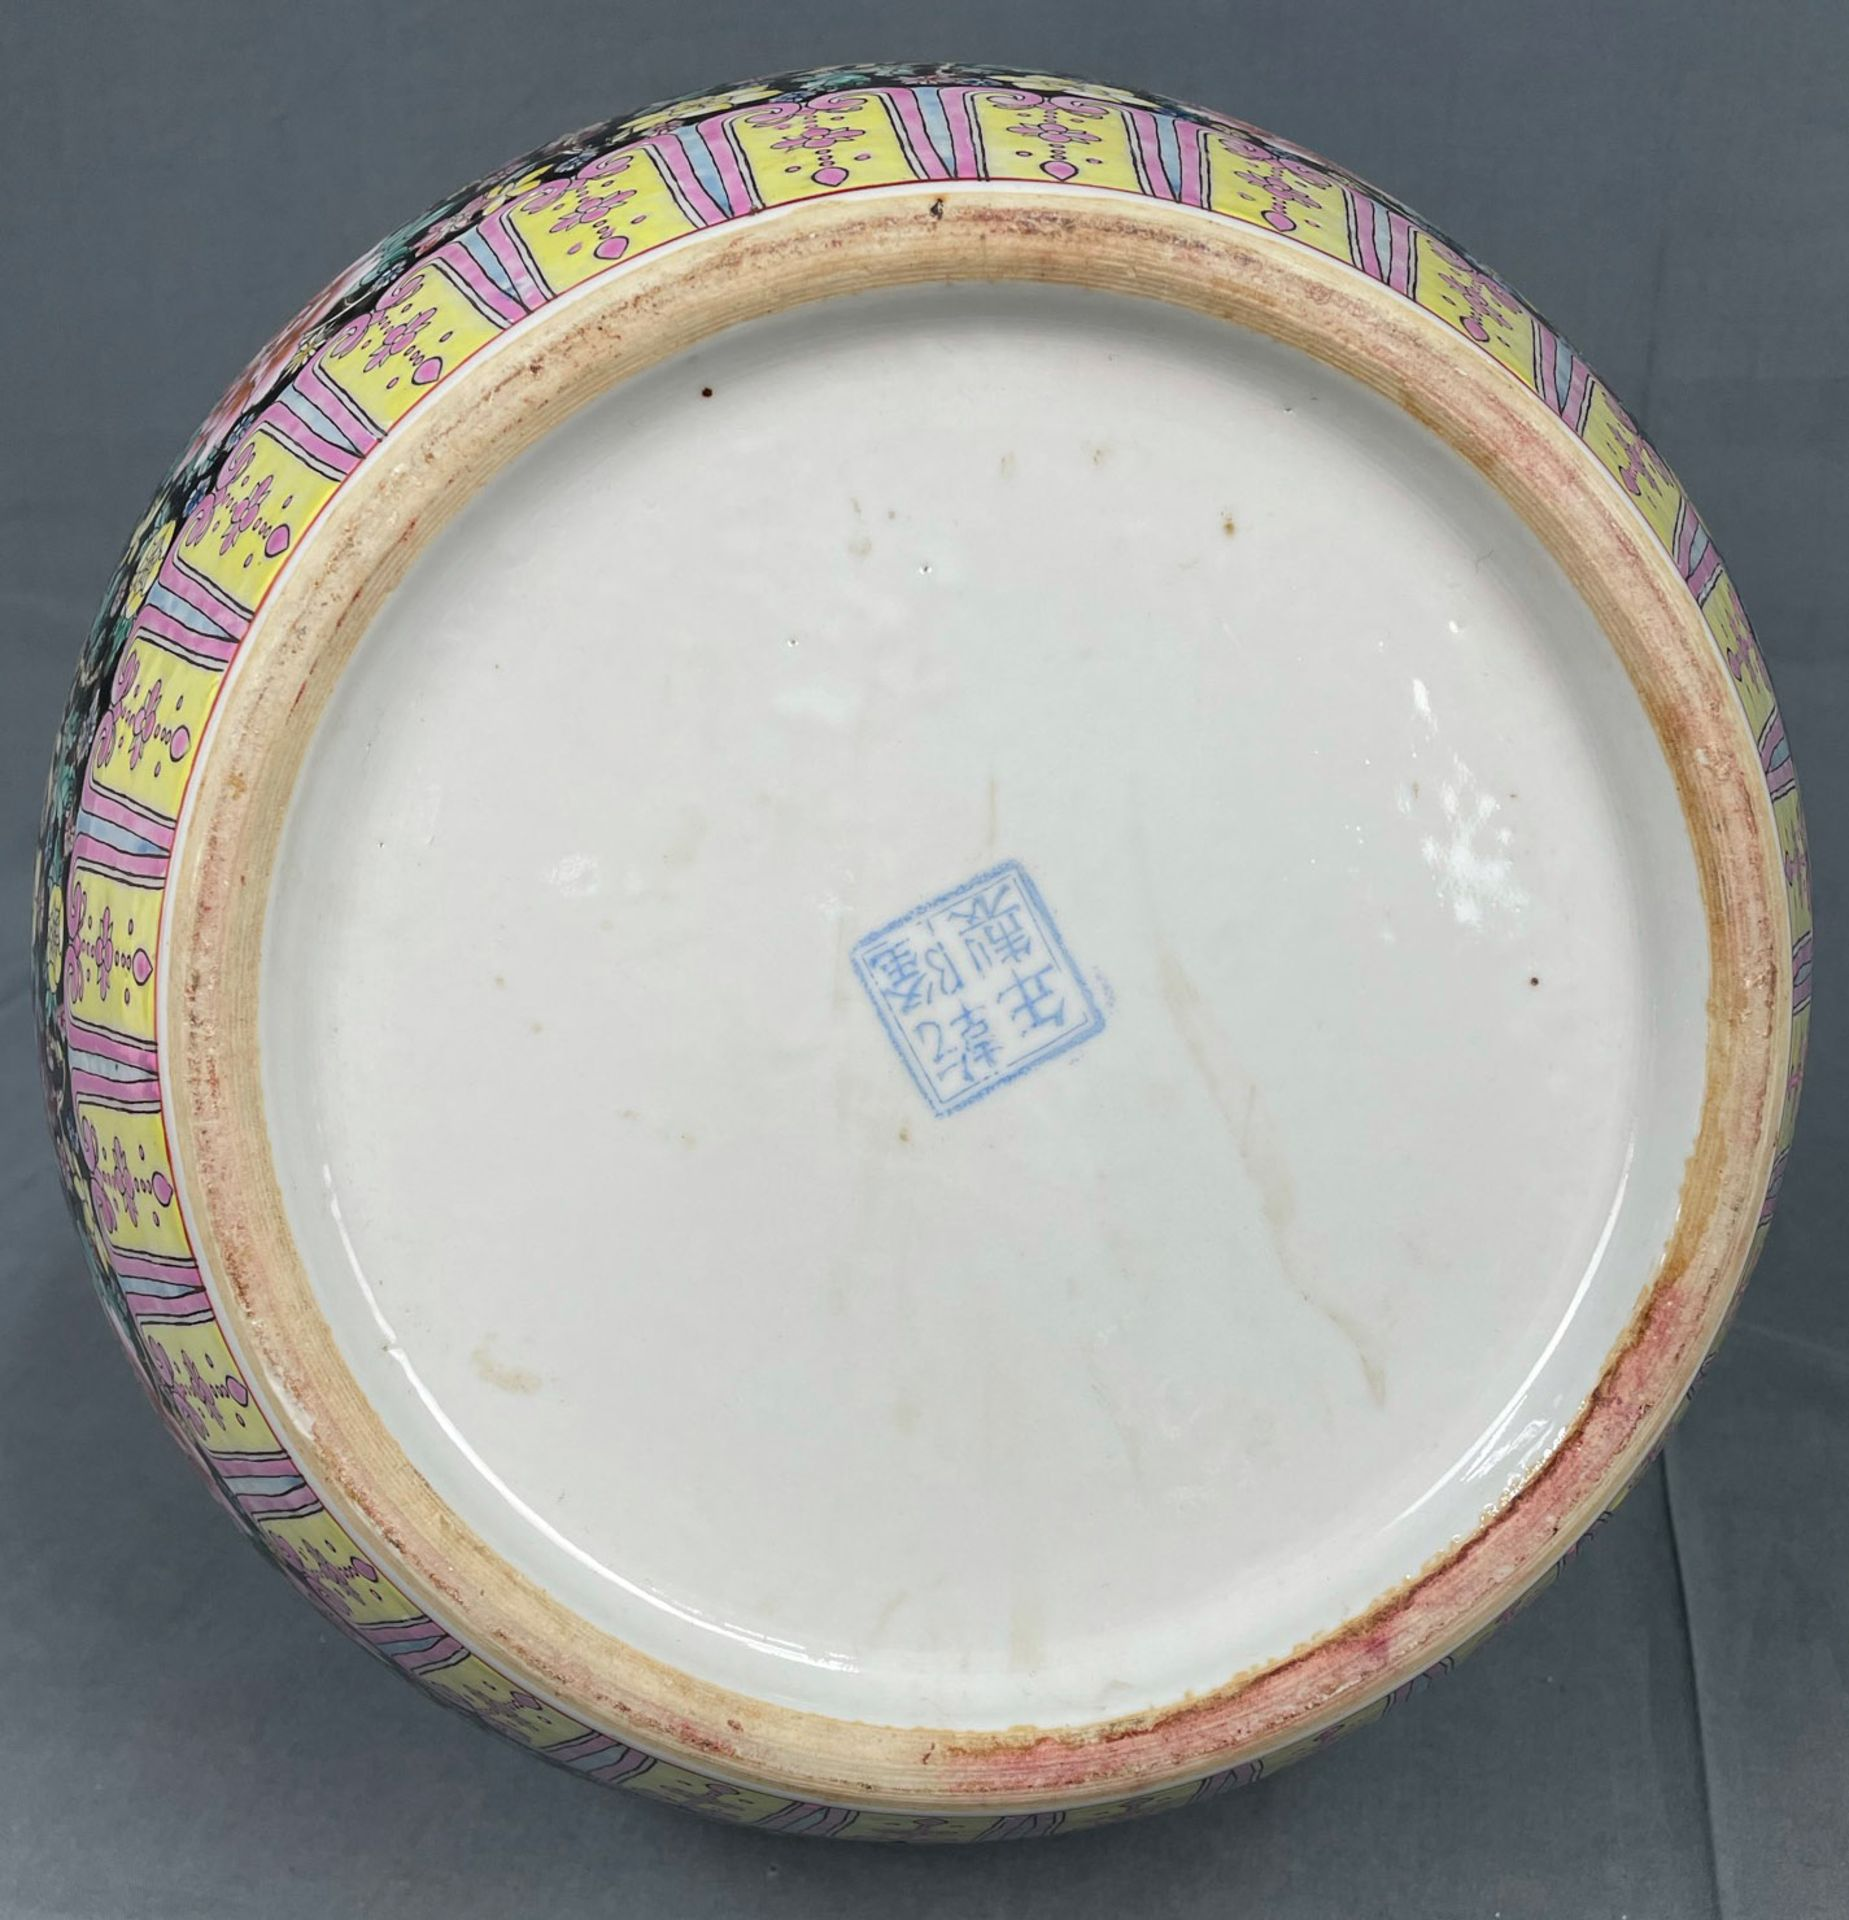 China. Porzellan. Vase. Stempelmarke circa 1930 - 1950. 53 cm hoch. - Image 19 of 20